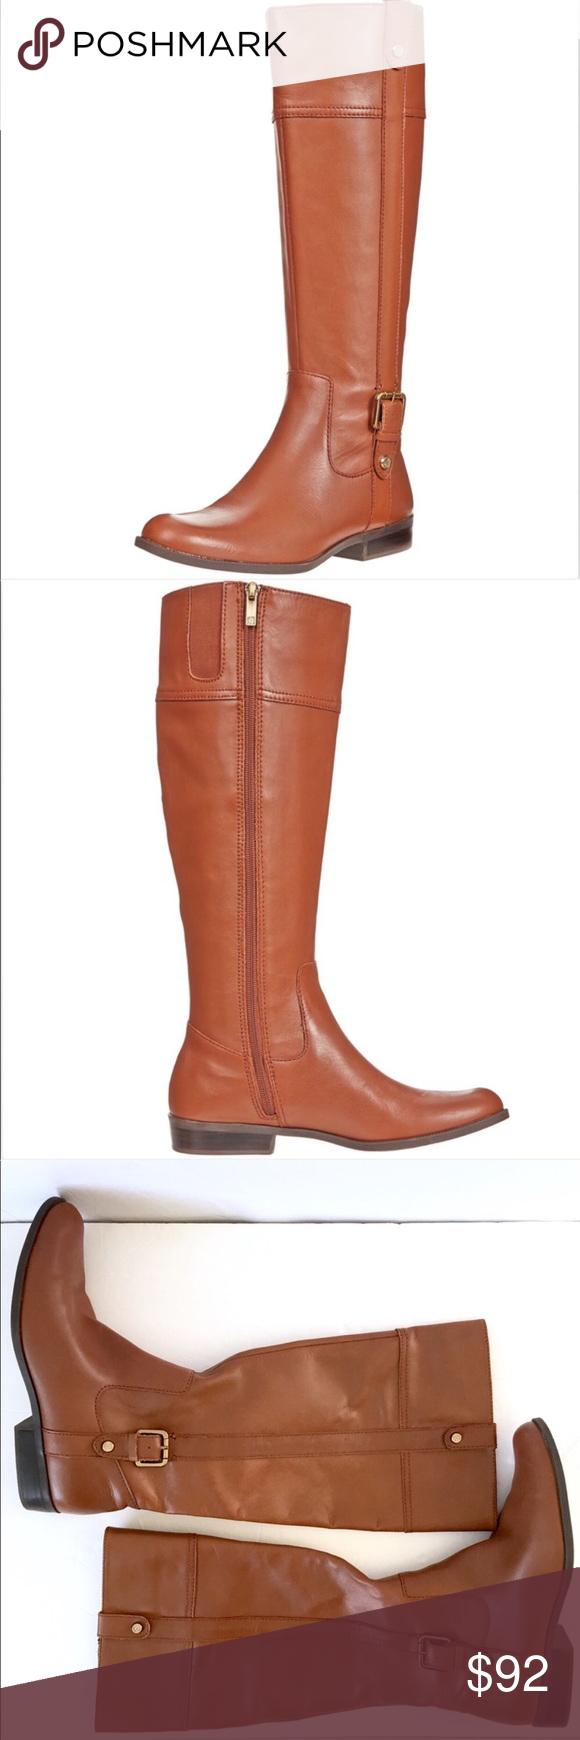 0c1907c264e Anne Klein leather Ciji iflex riding boot cognac Anne Klein cognac ciji  riding boots